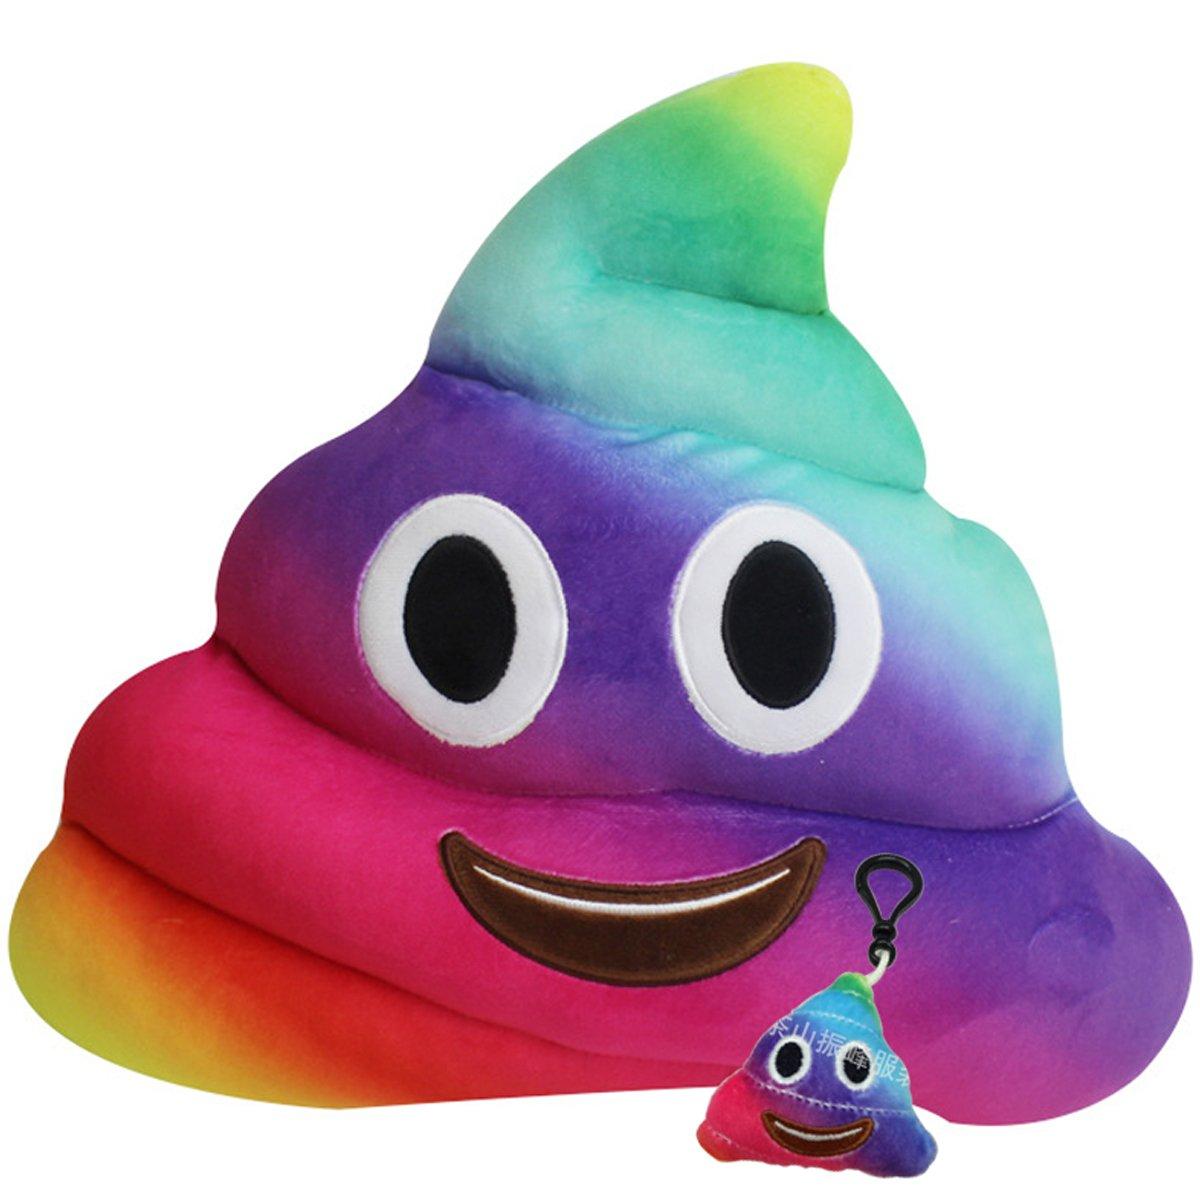 Wemi Emoji Plush Toys Cartoon Cushion 14 inches Poop Stuffed Rainbow Pillows Dolls